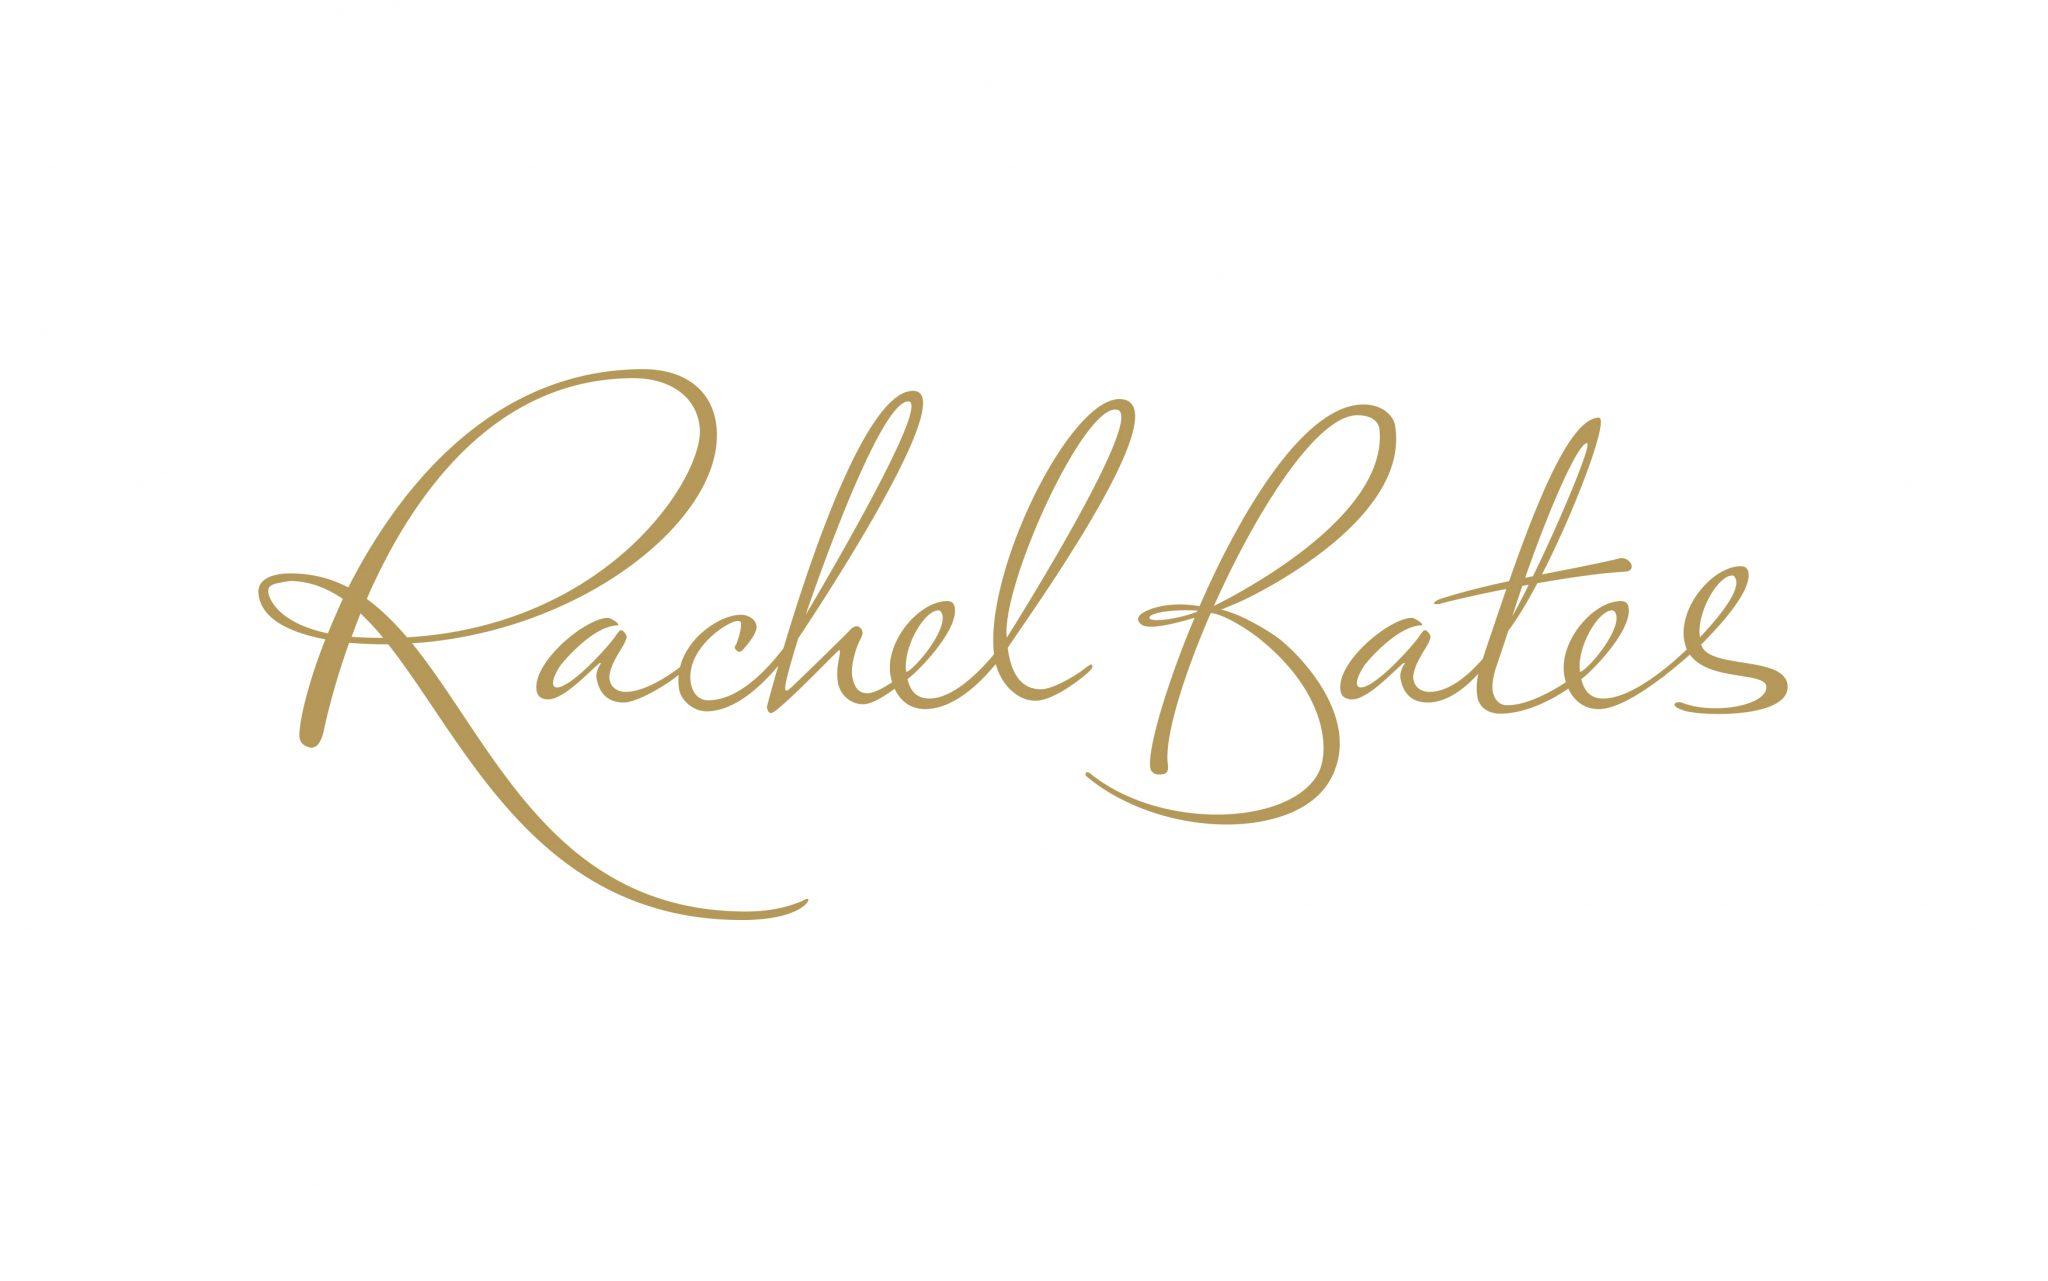 Rachel Bates